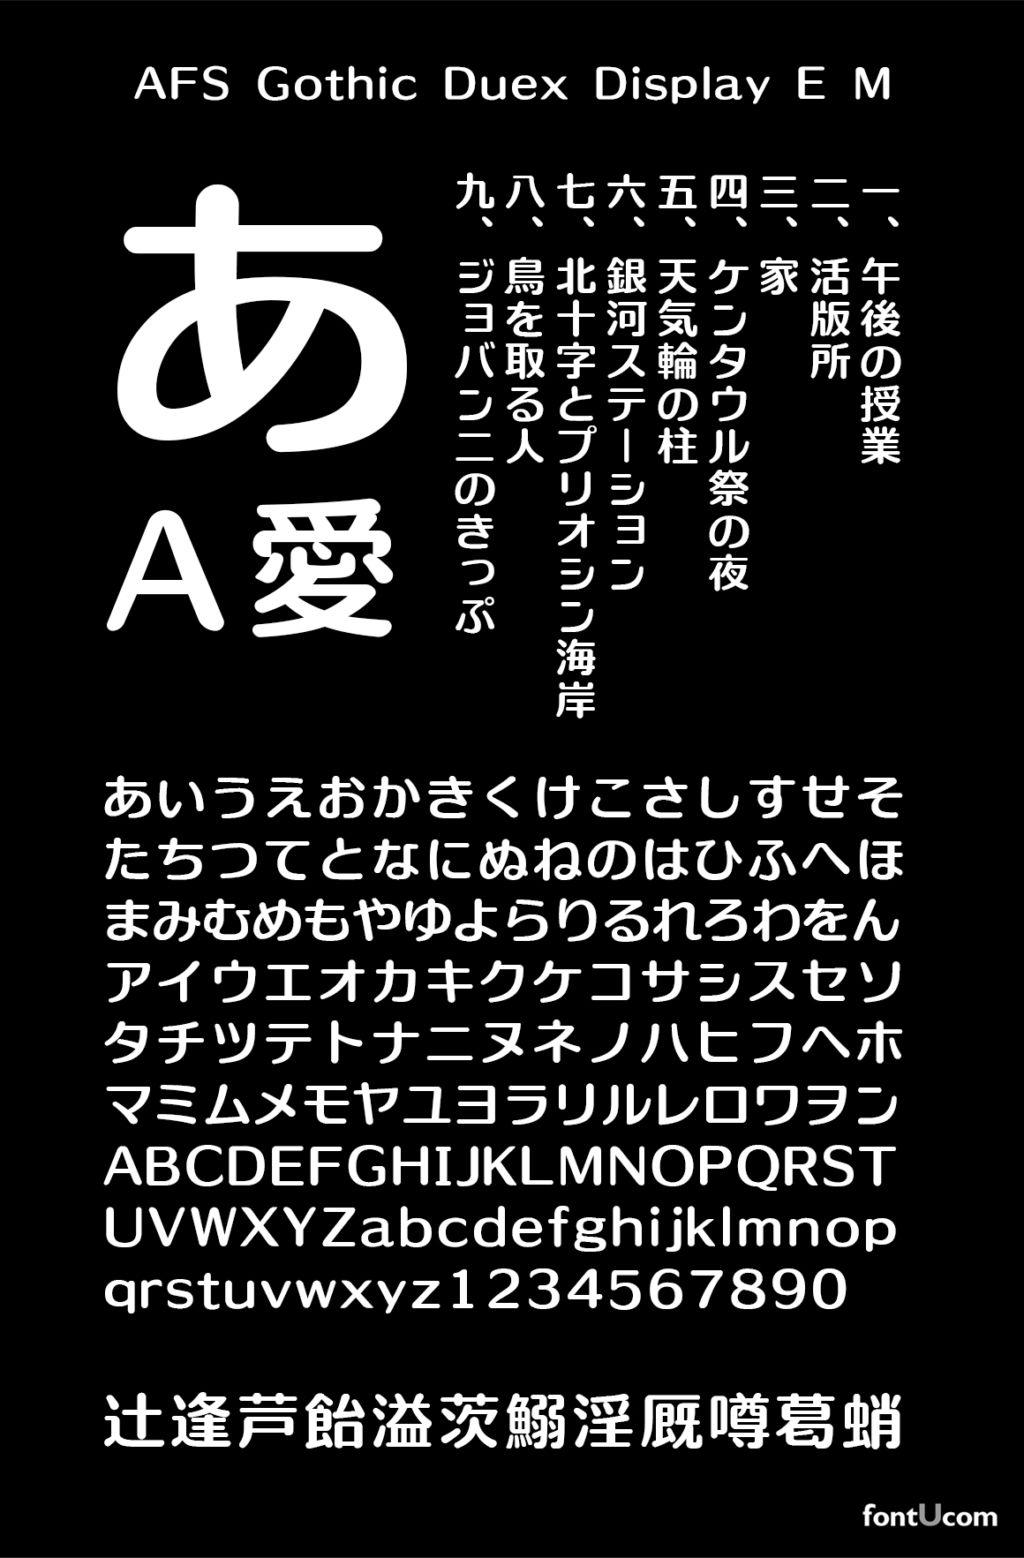 AFS GothicDuex Display E_M